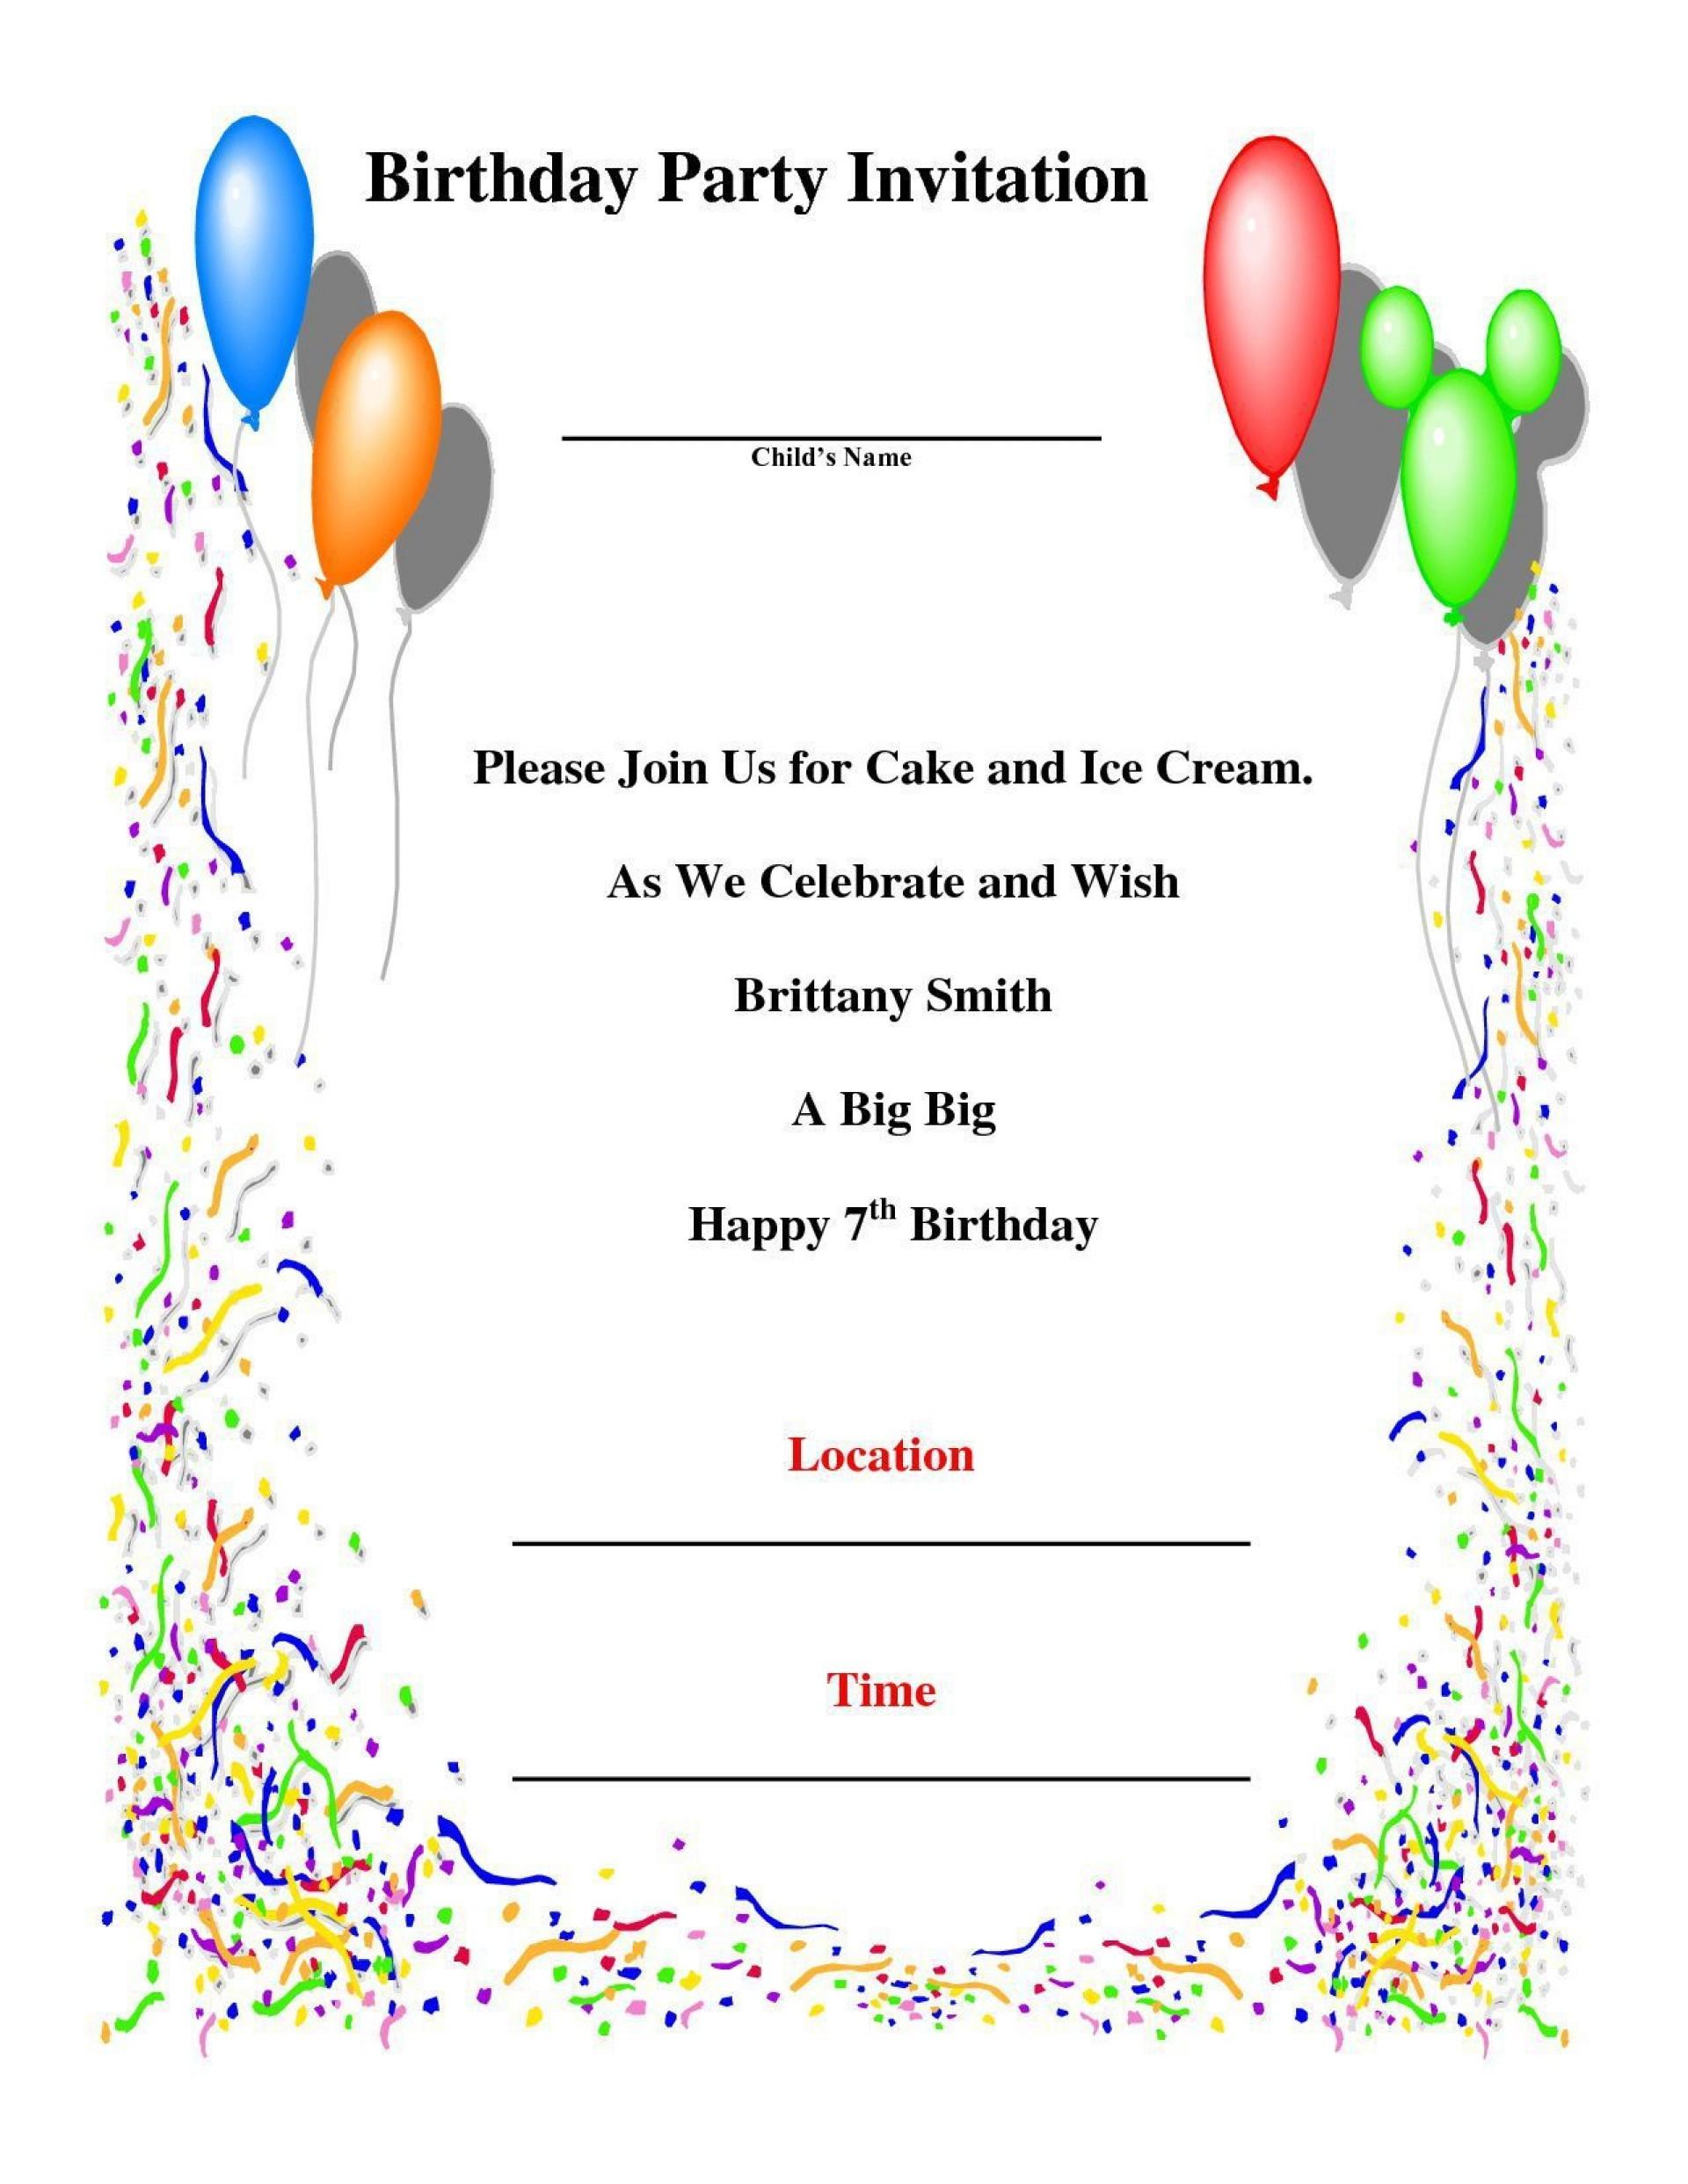 010 Best Birthday Invitation Card Word Format High Def  Template Free1920